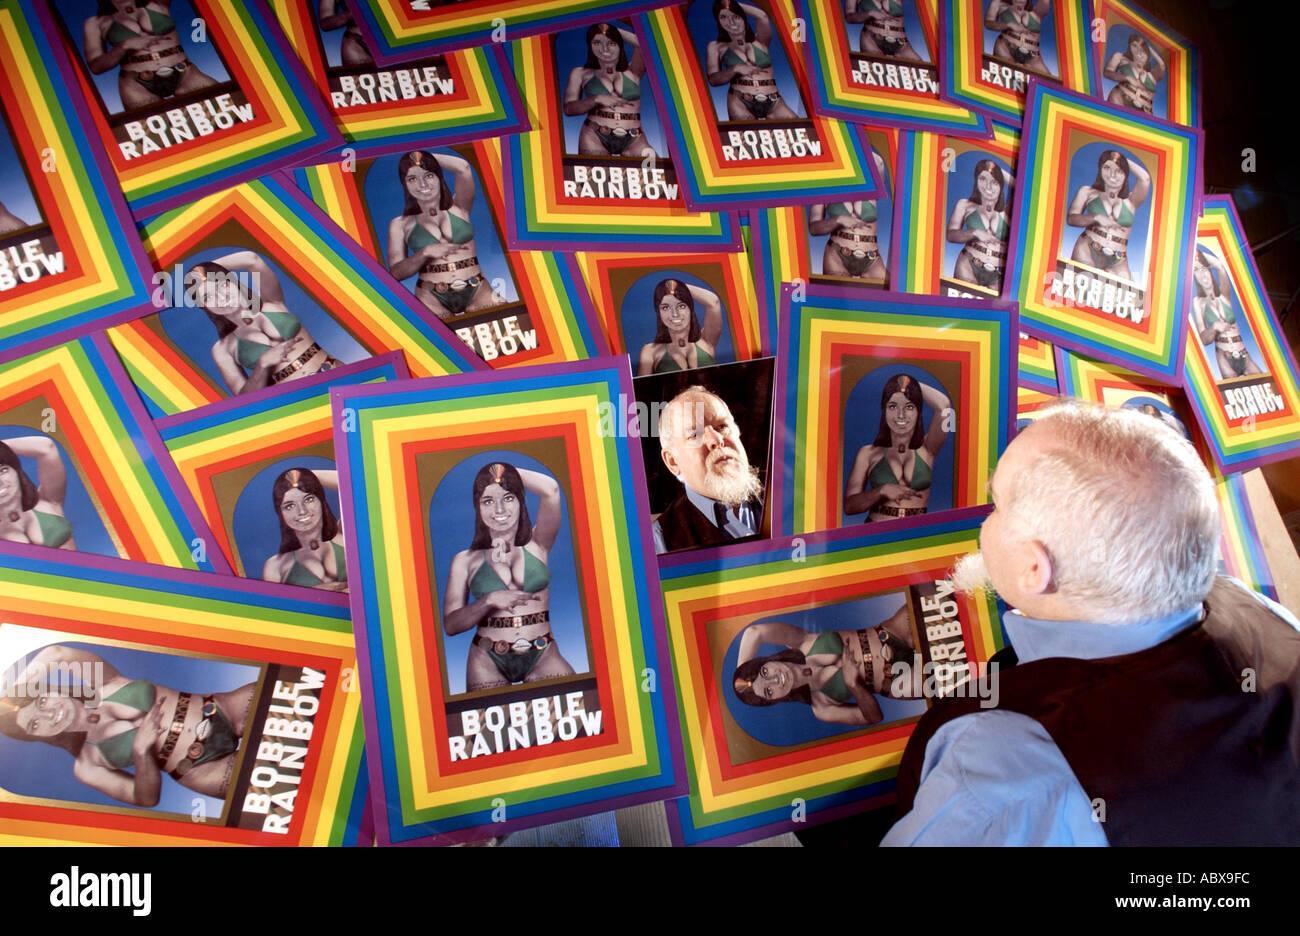 Artist Peter Blake with Bobbie Rainbow tinplate prints. - Stock Image